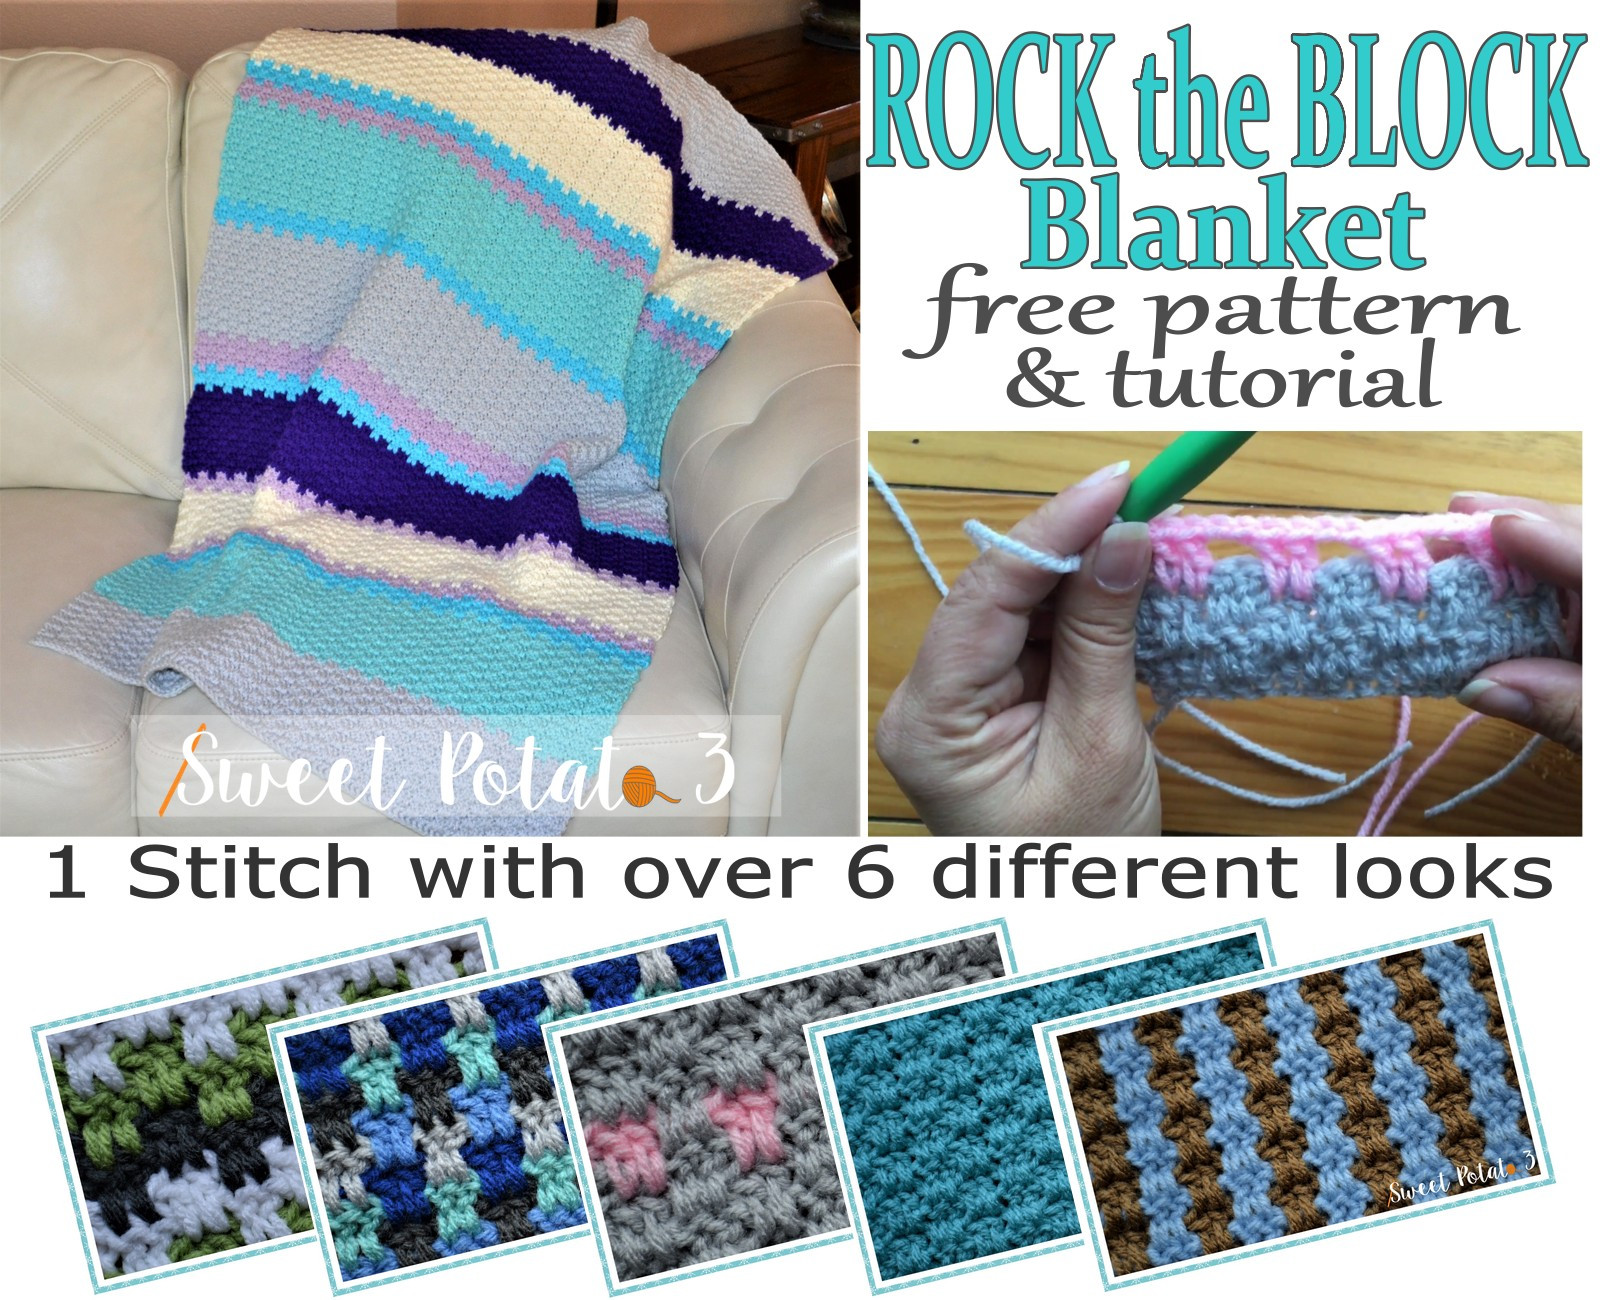 Free Rock the Block Blanket Pattern & Tutorial